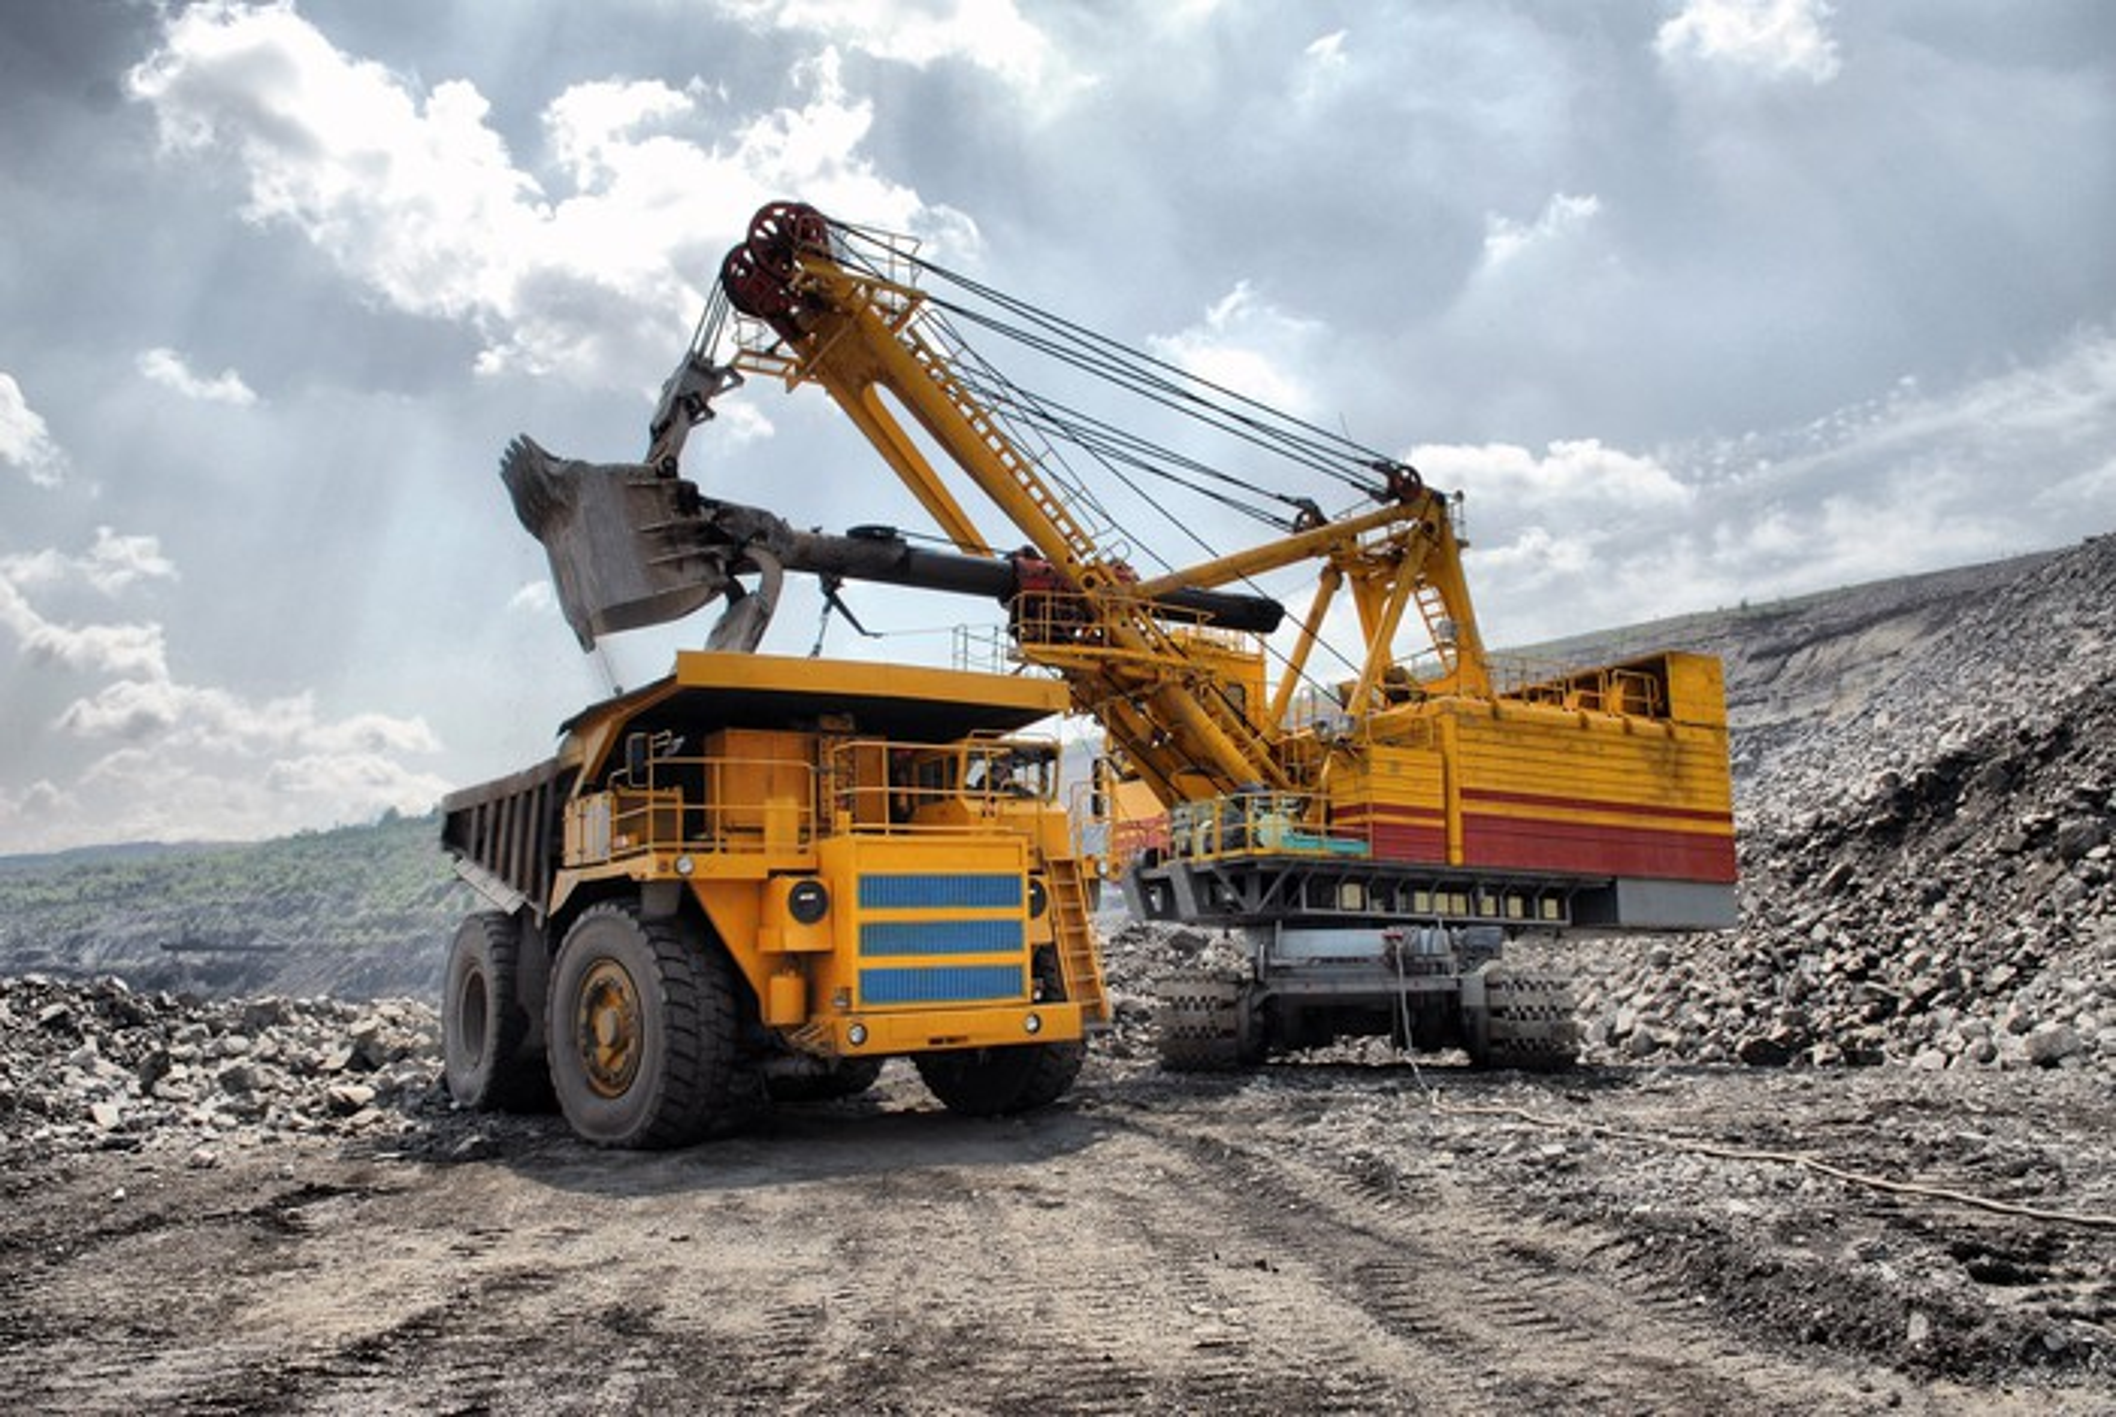 An excavator loading a dump truck in an open mine pit.